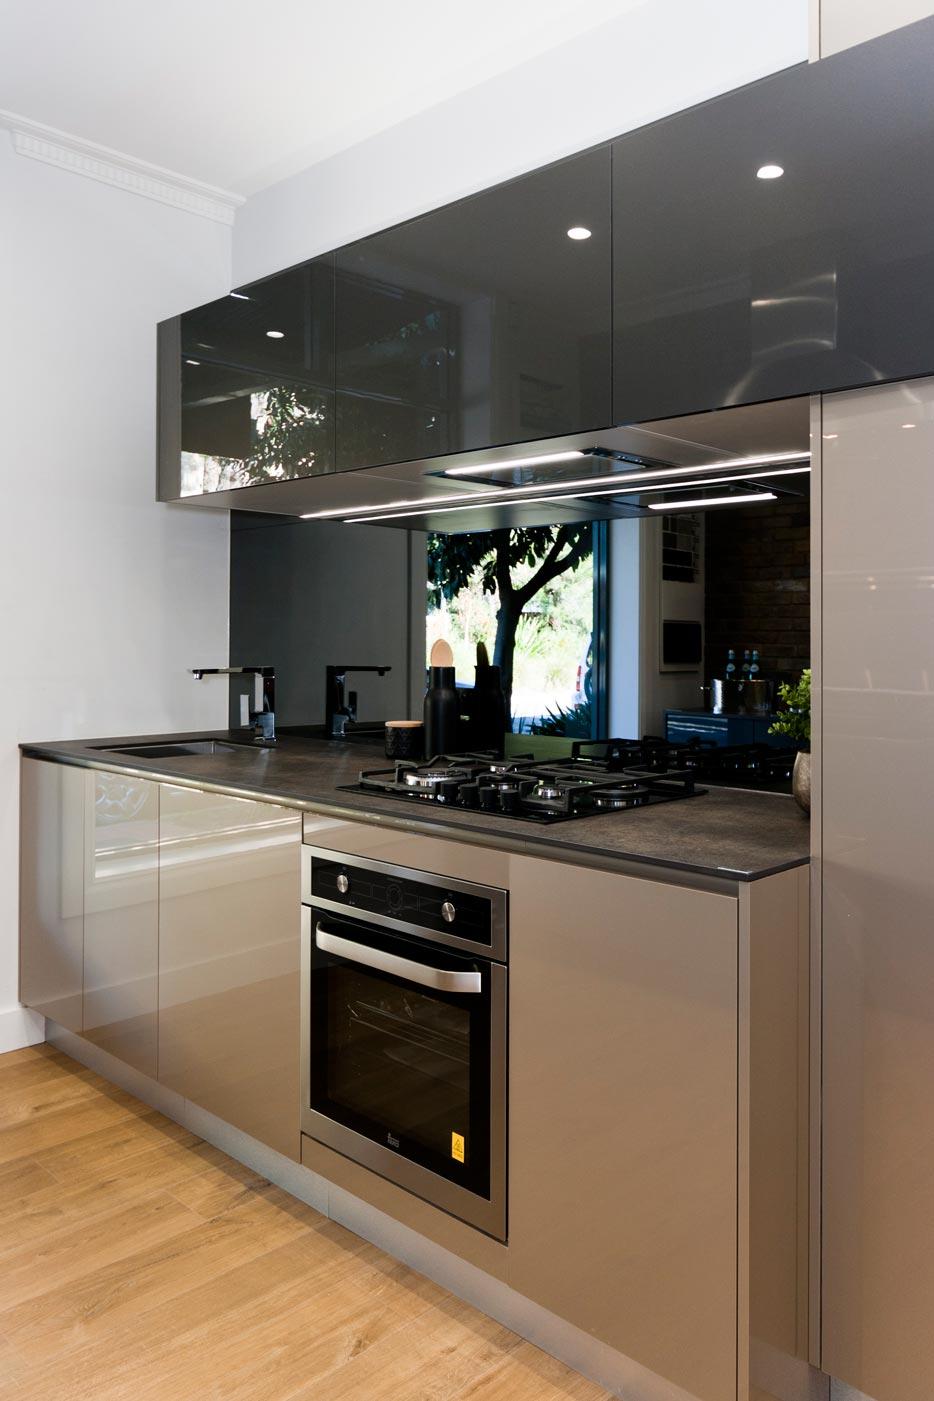 Contemporary compact kitchen design, Neolith benchtop, high gloss finish, dark palette, mirror splashback